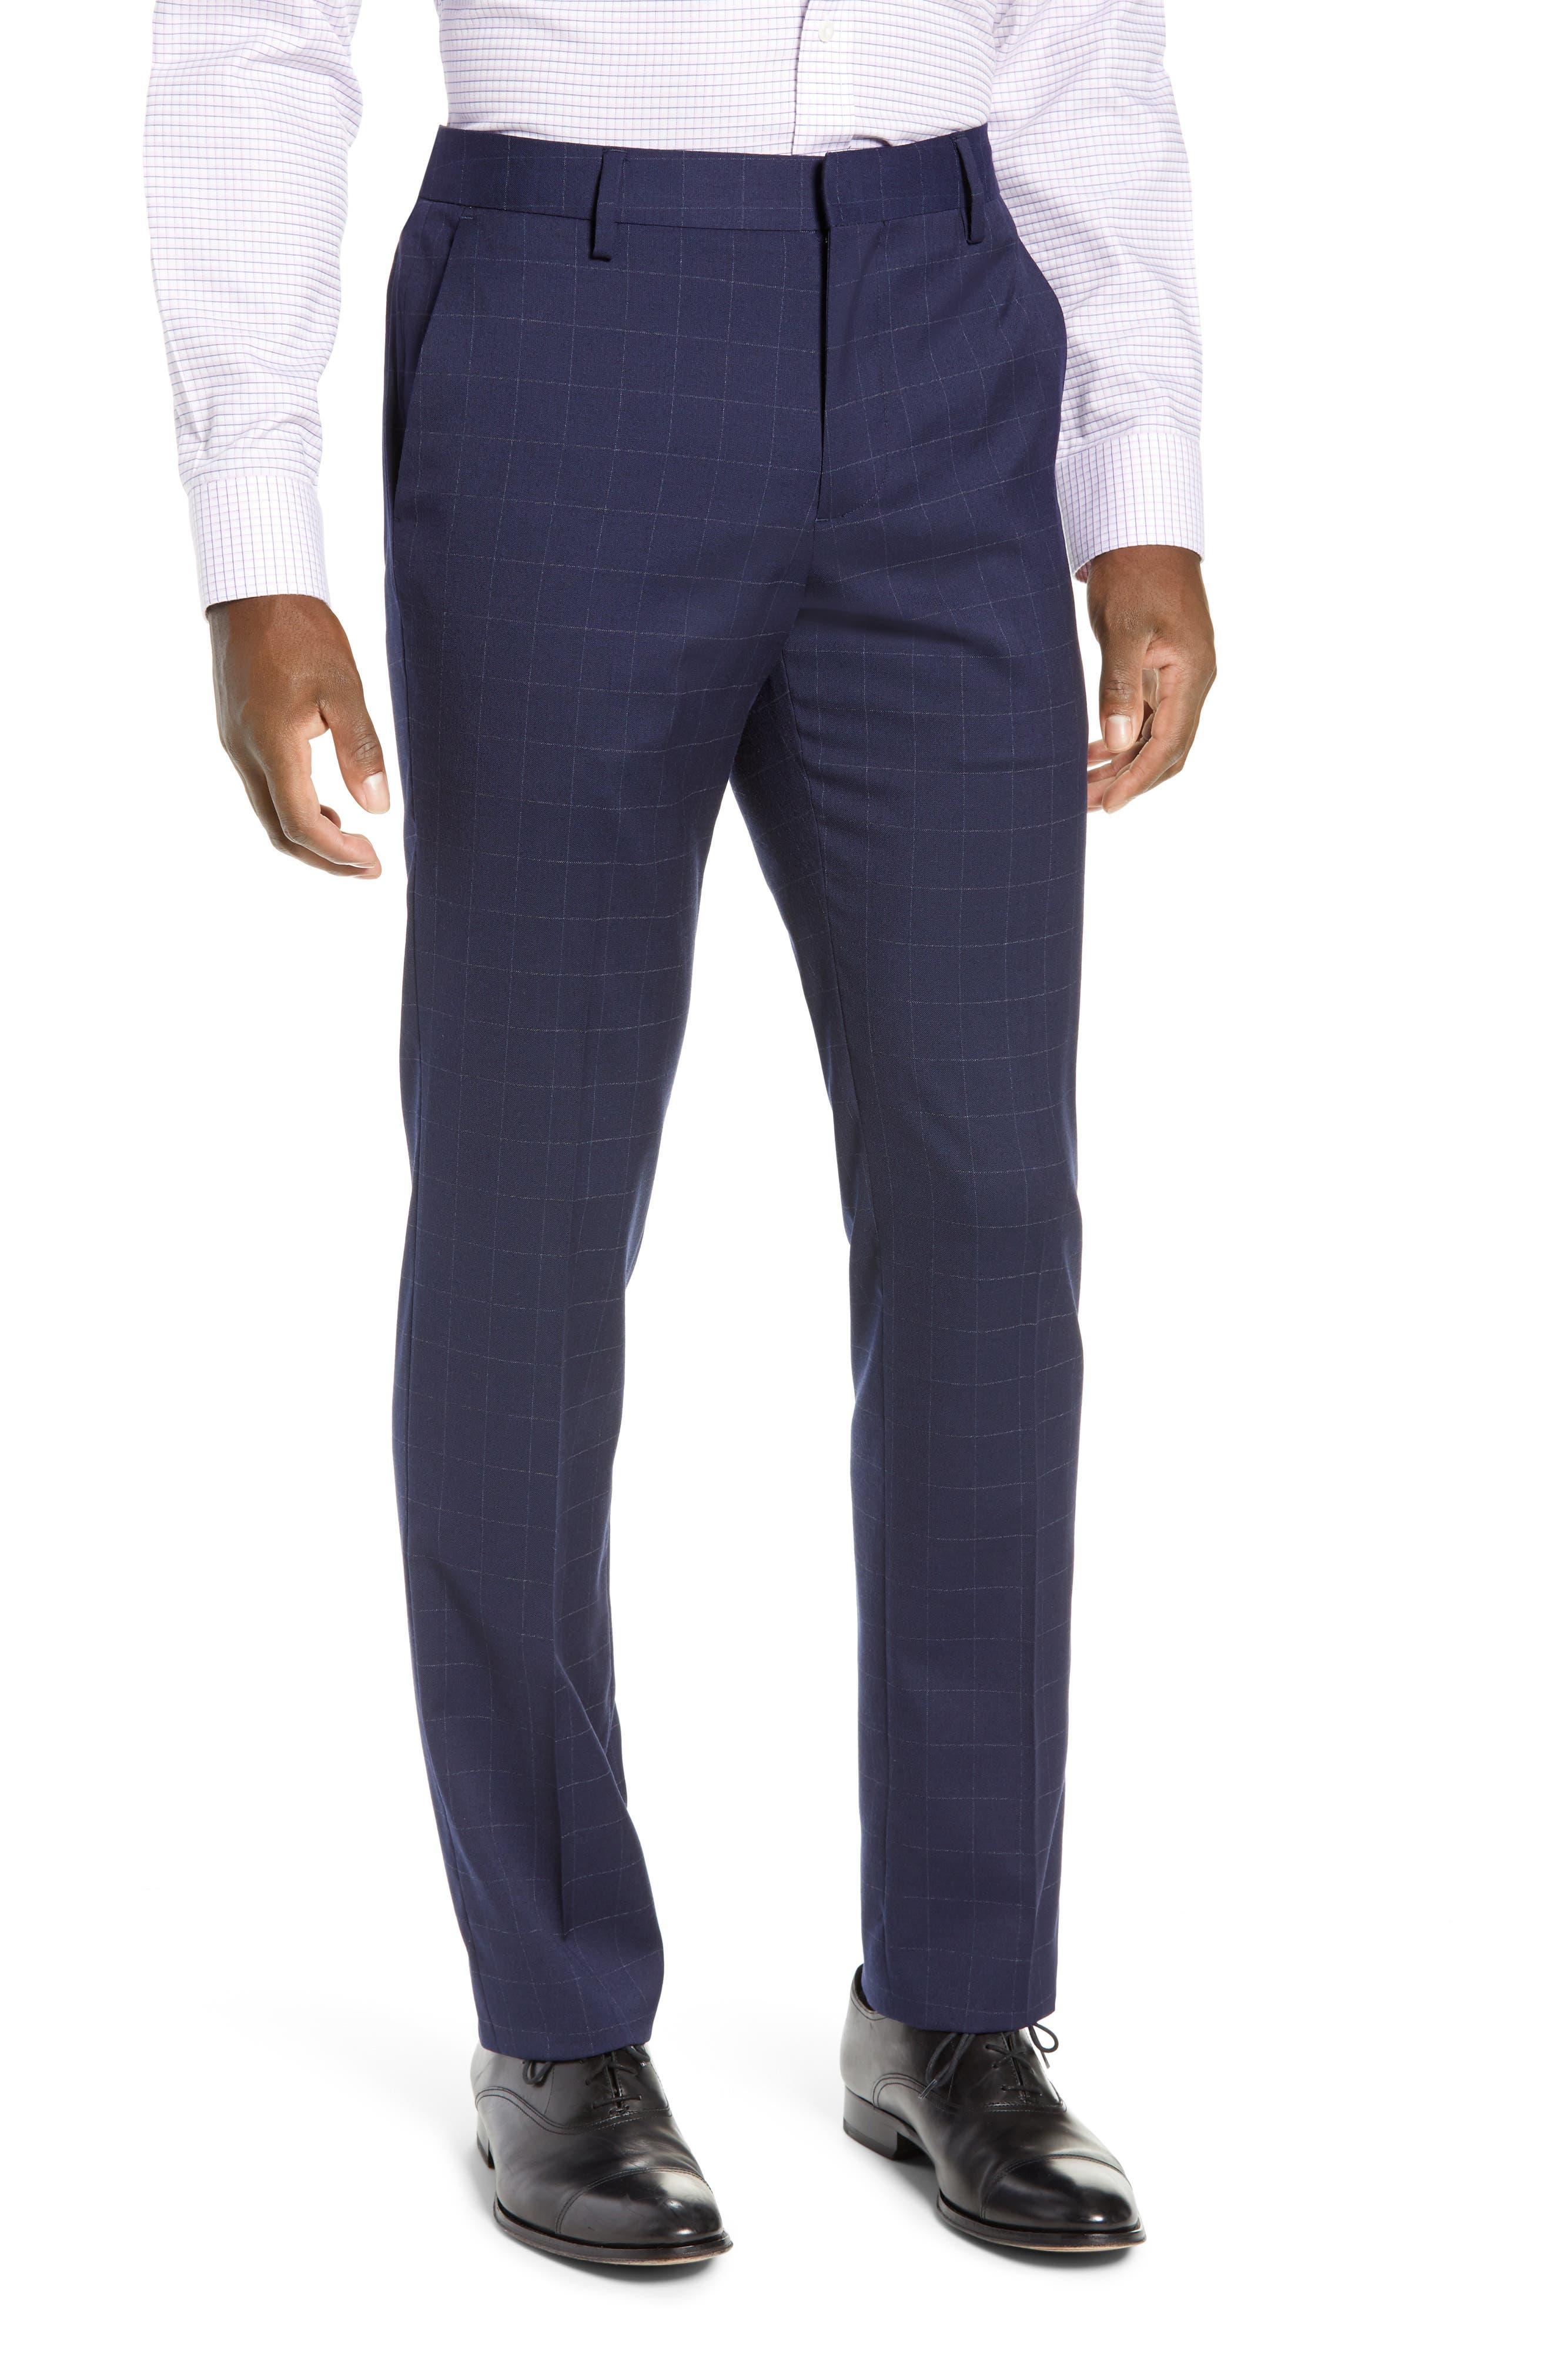 Jetsetter Slim Fit Stretch Suit Pants,                         Main,                         color, NAVY CHALK WINDOWPANE